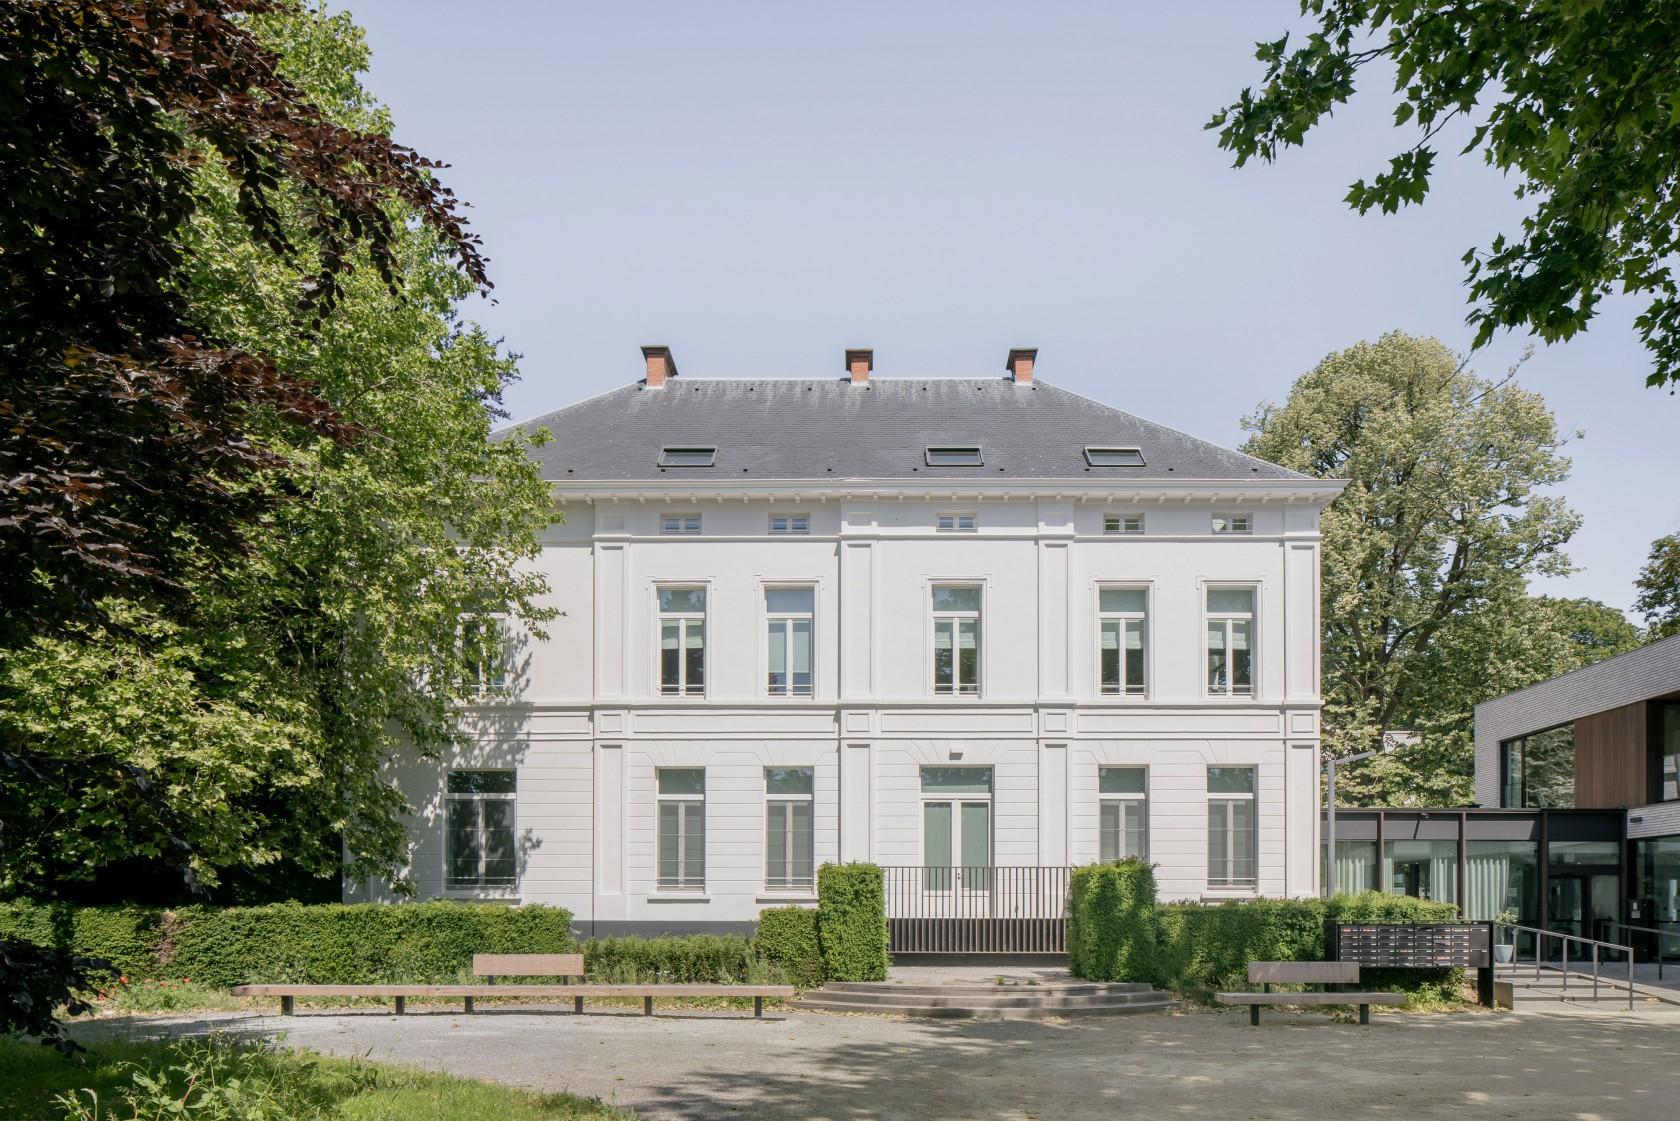 Abscis Architecten - frontal view on the neoclassical castle - photography Jeroen Verrecht